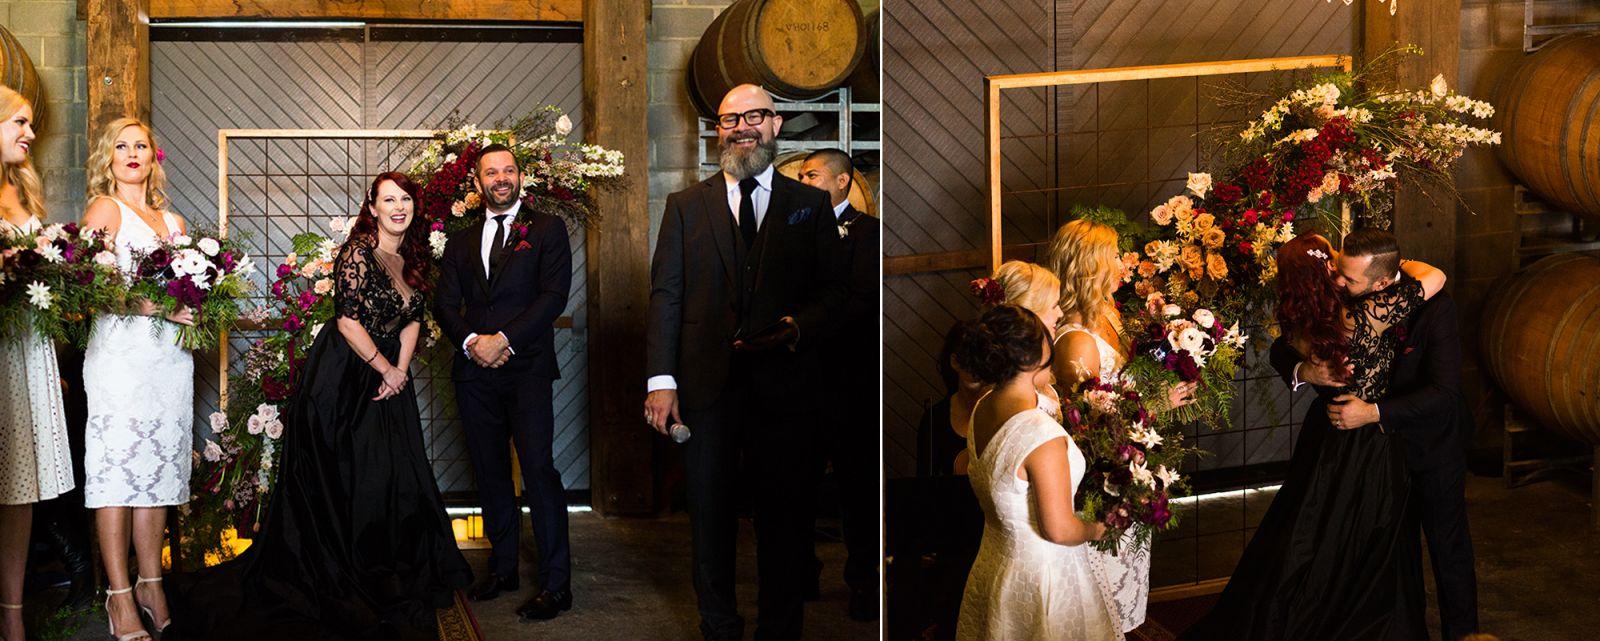 7_wedding-ceremony-captured-by-hunter-valley-wedding-photographer-at-wandin-valley